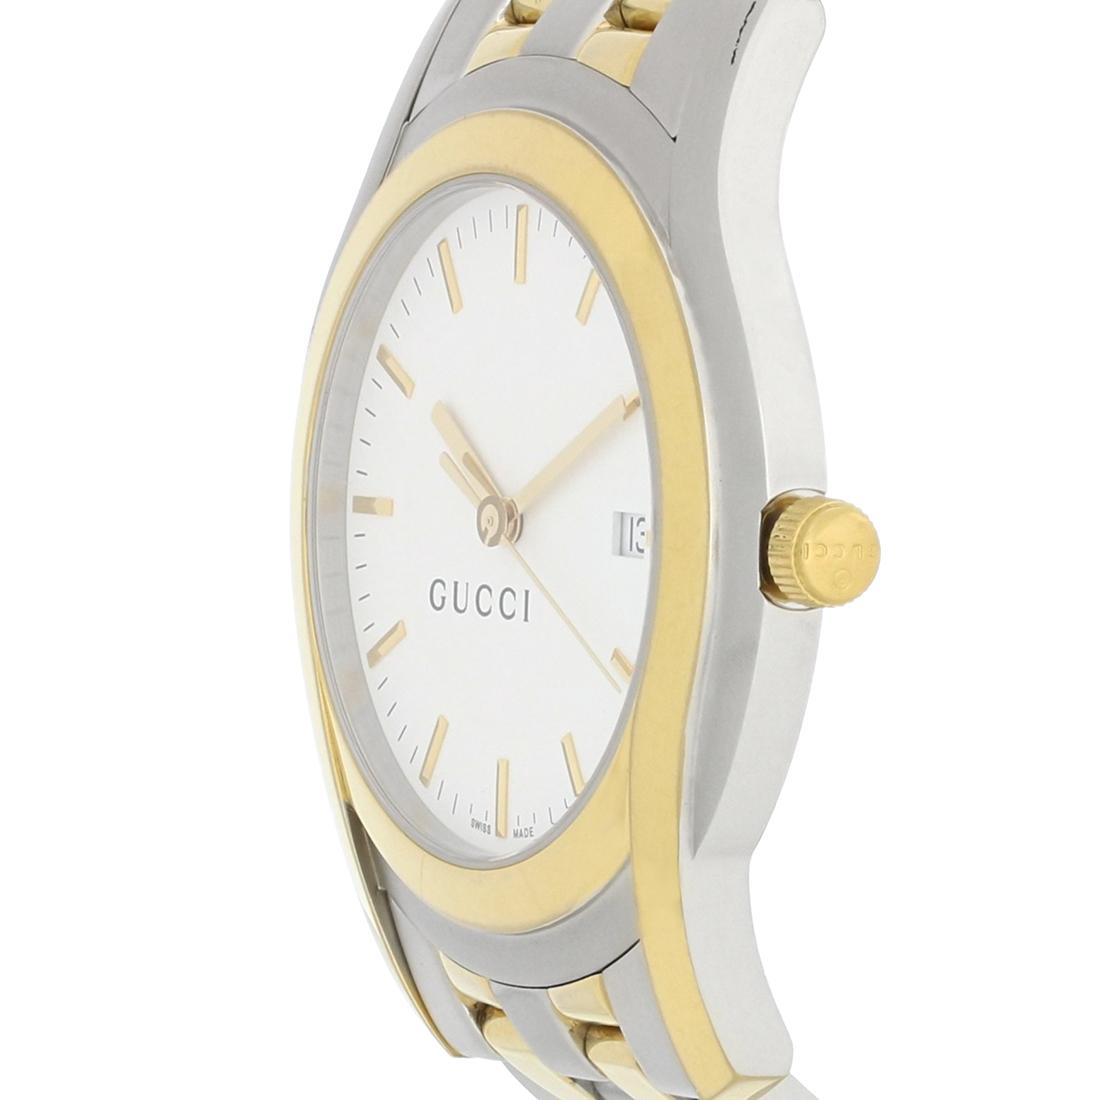 0c512f206f7 Gucci 5500 XL Series Mens White Dial Two Tone Dress Quartz Watch YA055216